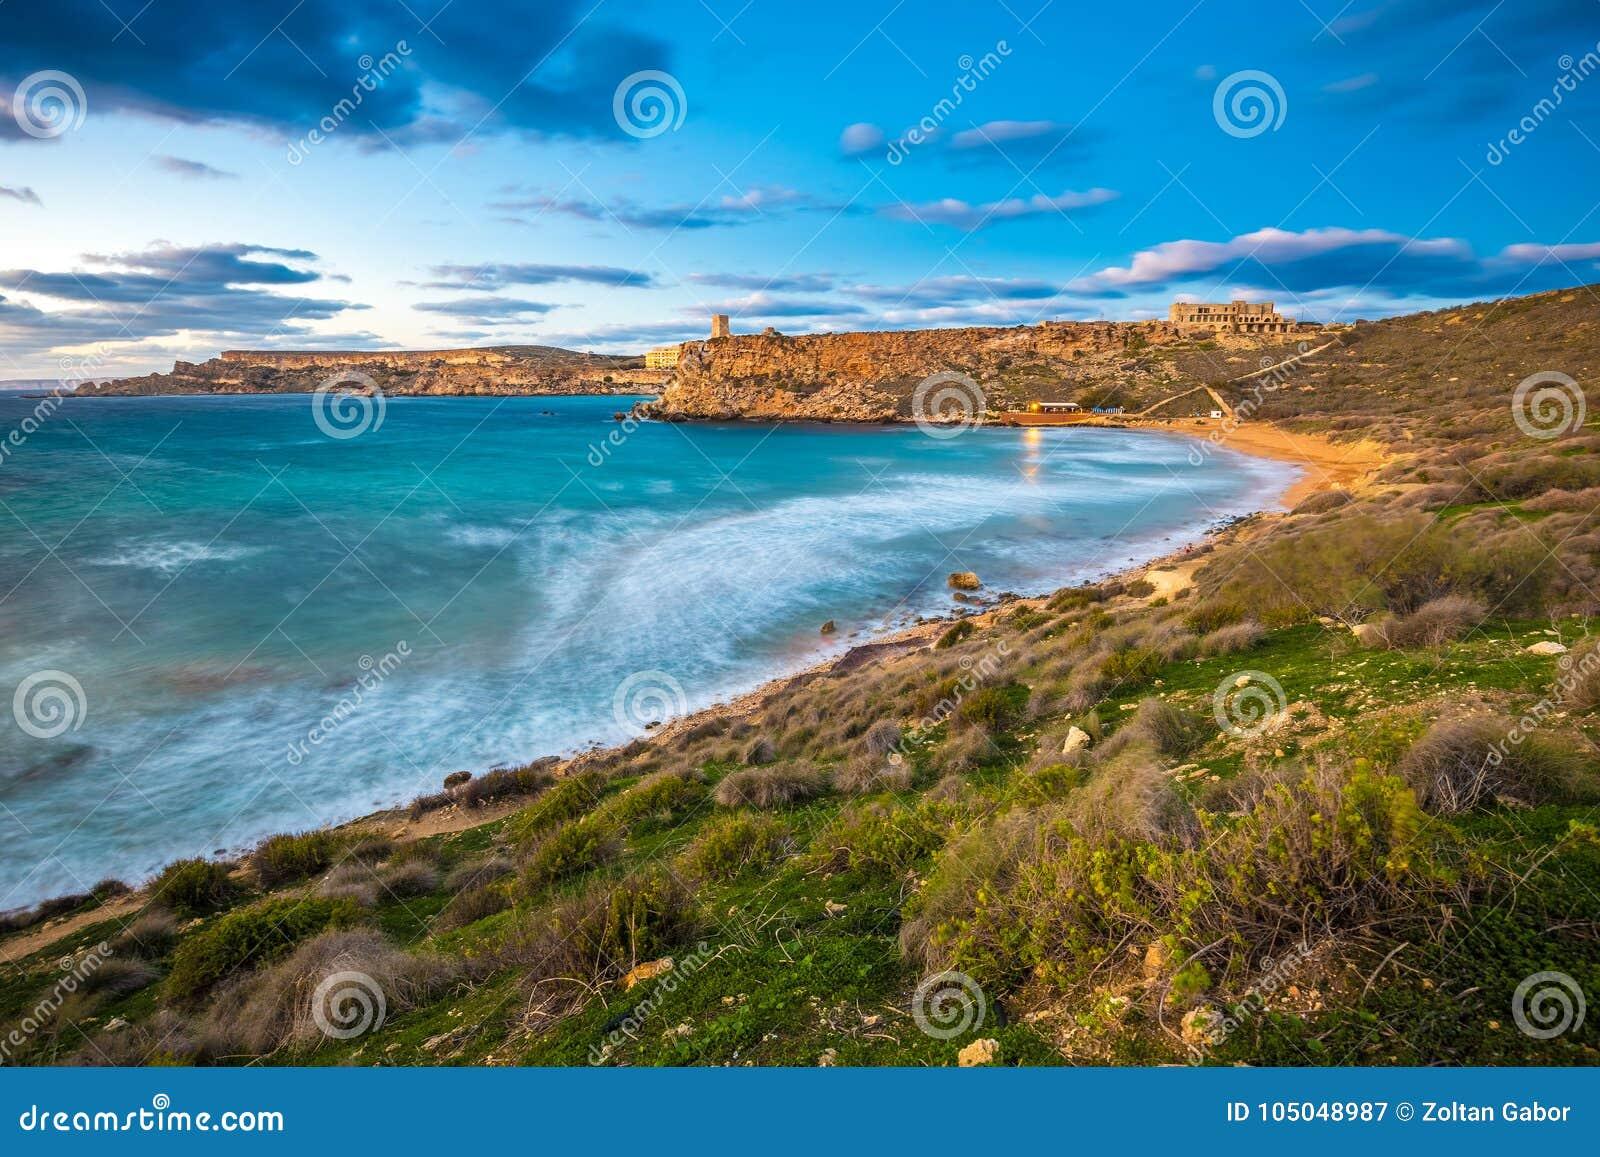 Mgarr, Μάλτα - ο διάσημος κόλπος Ghajn Tuffieha στην μπλε ώρα σε έναν μακρύ πυροβολισμό έκθεσης